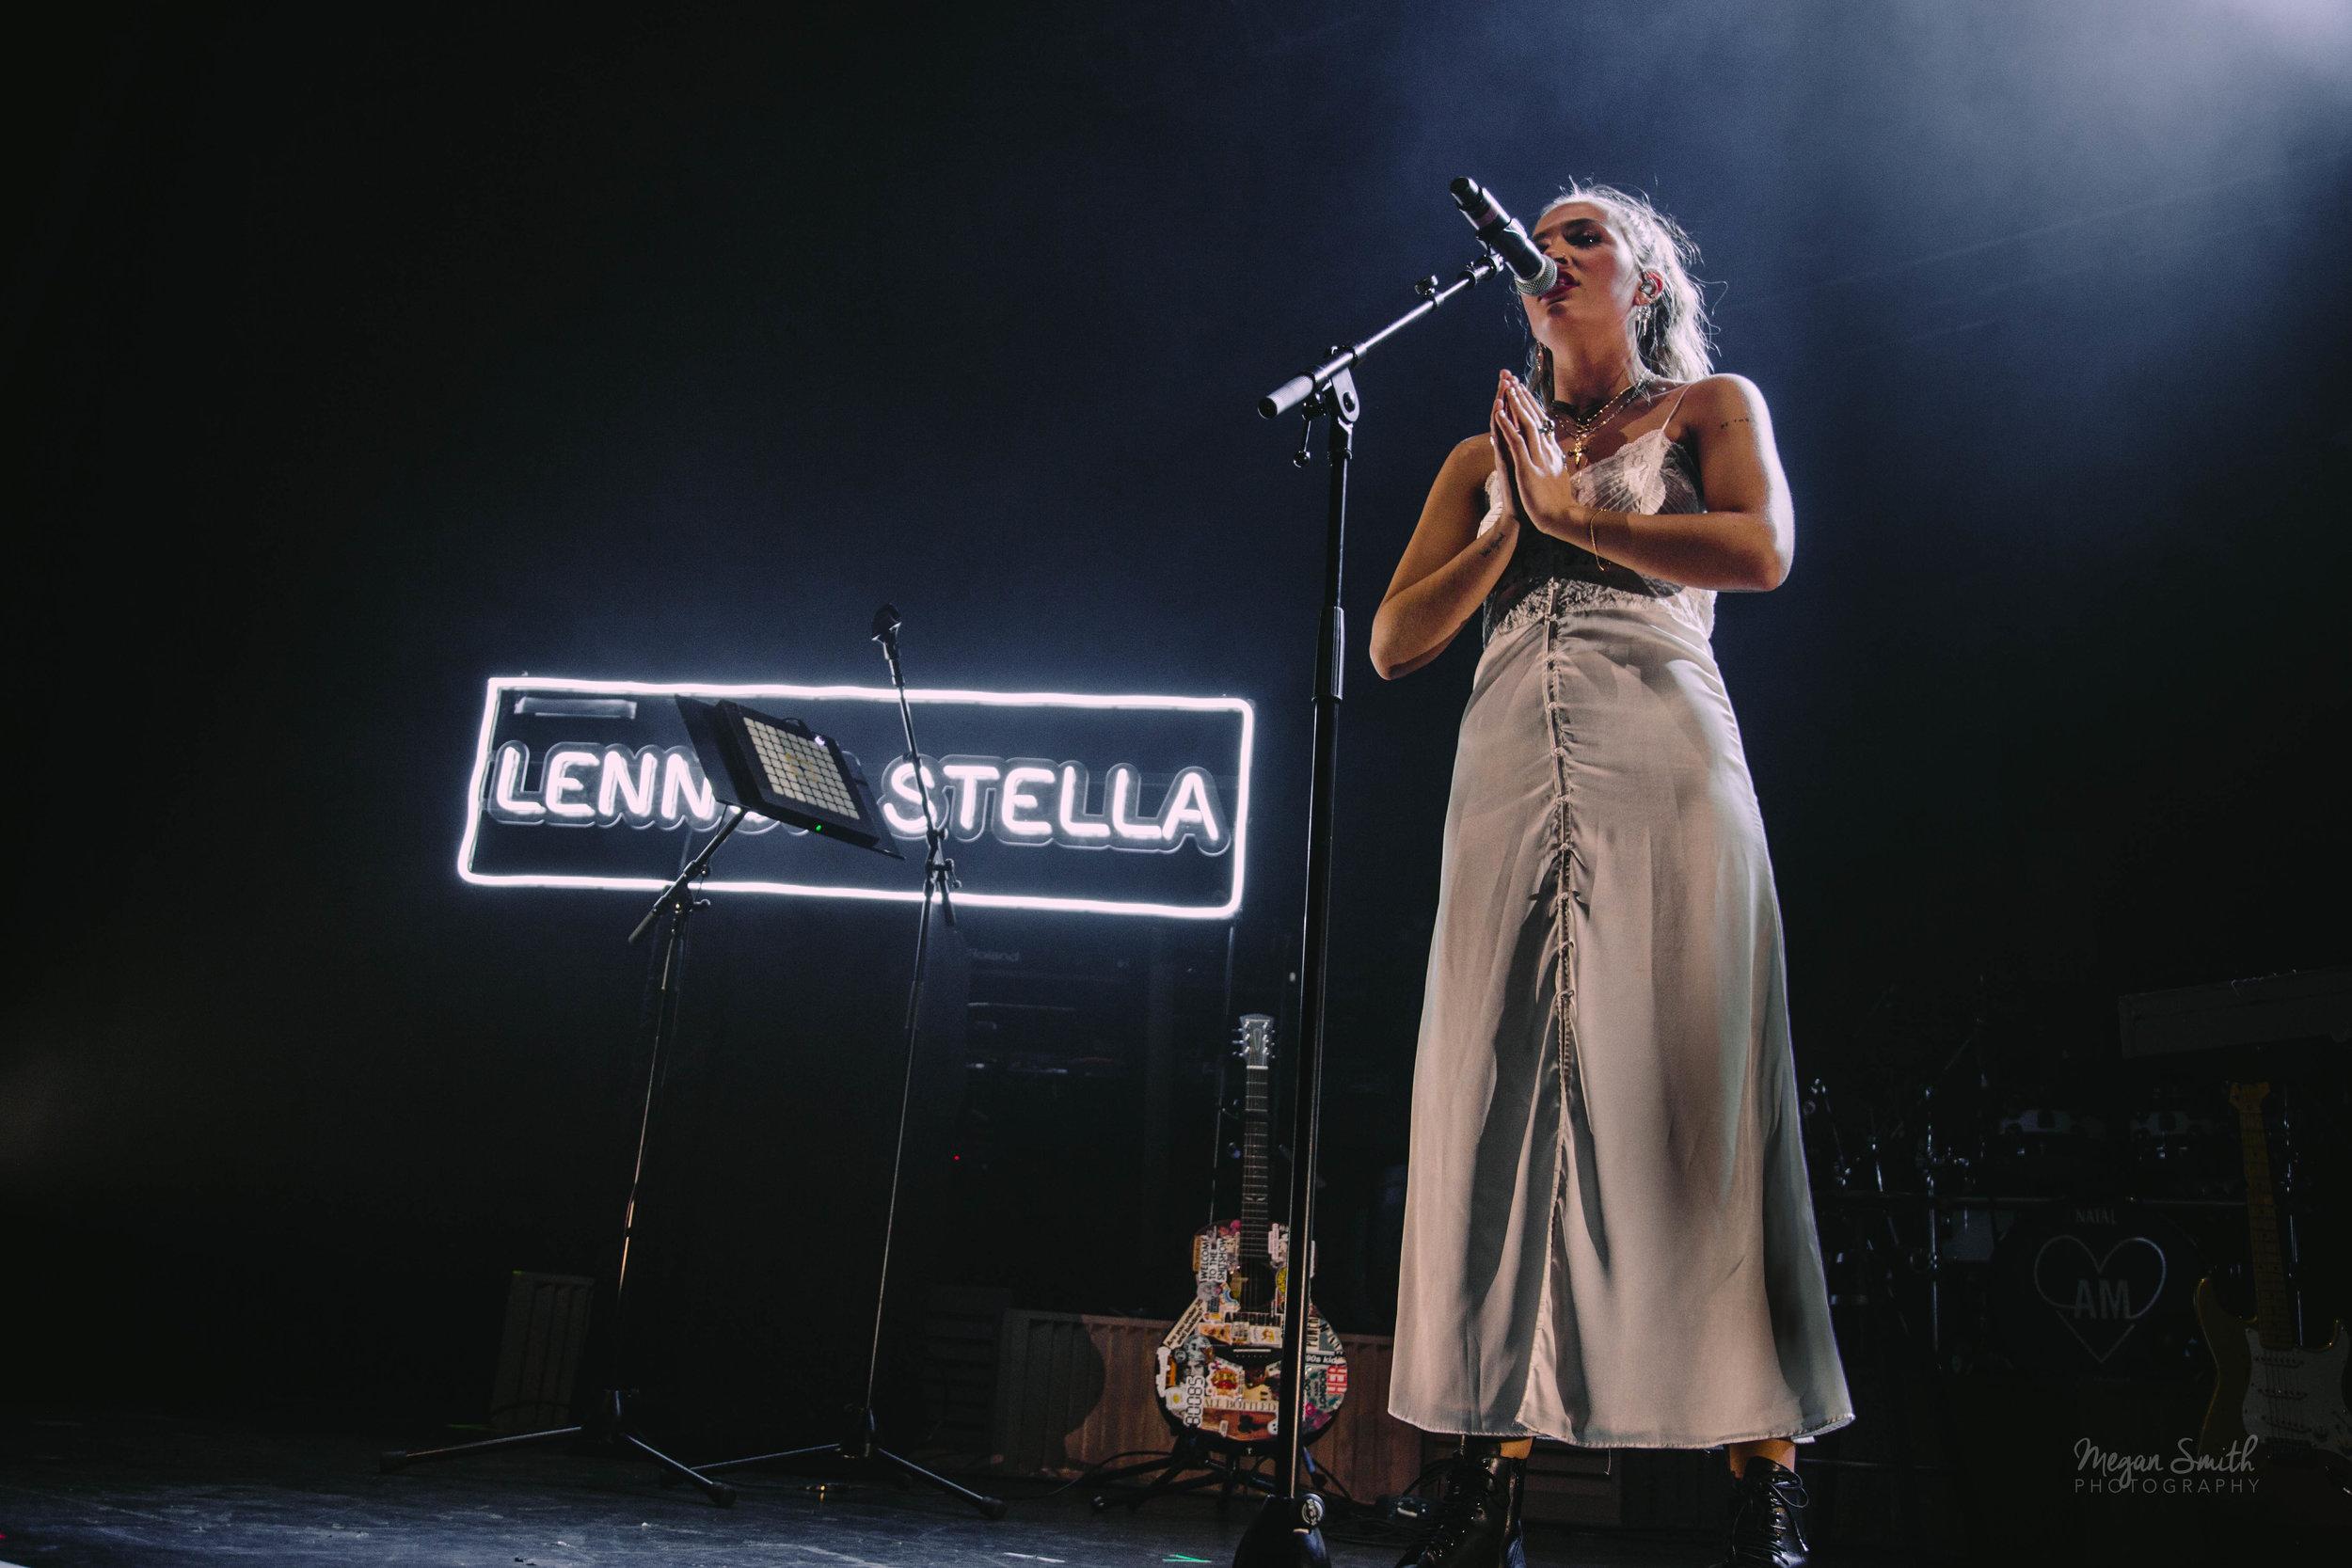 Lennon-Stella-0524.jpg